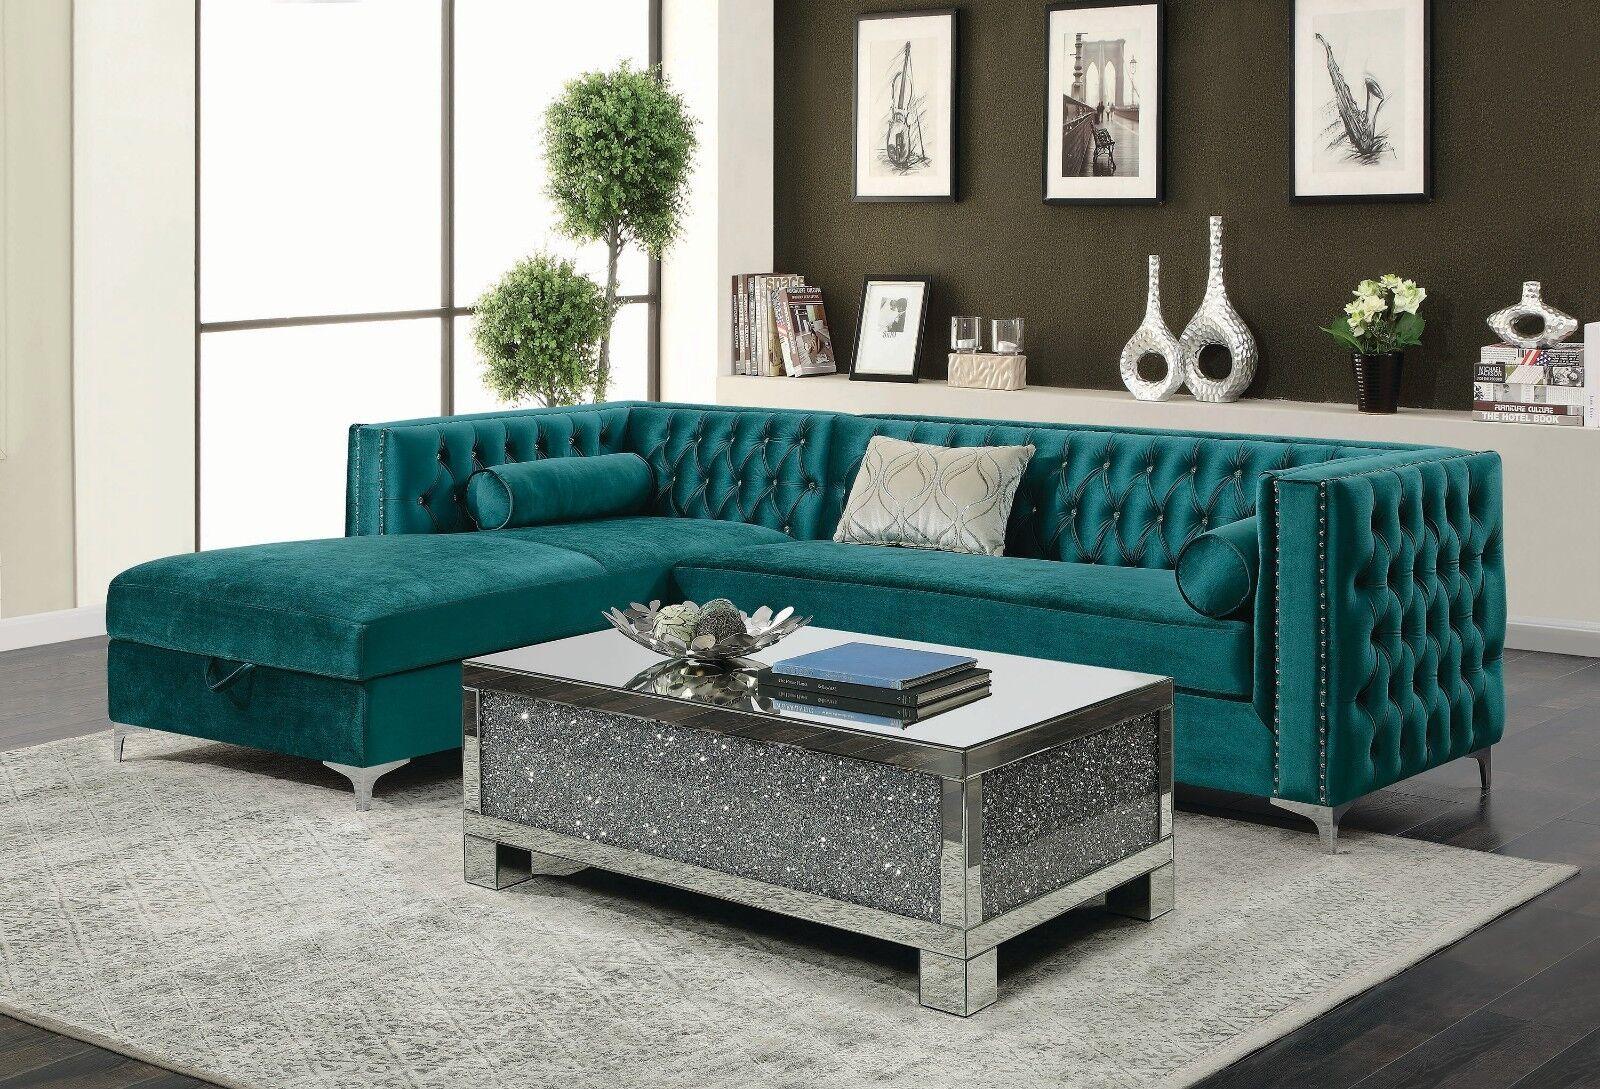 Contemporary Green Velvet Storage Sofa Sectional Living Room Furniture Set